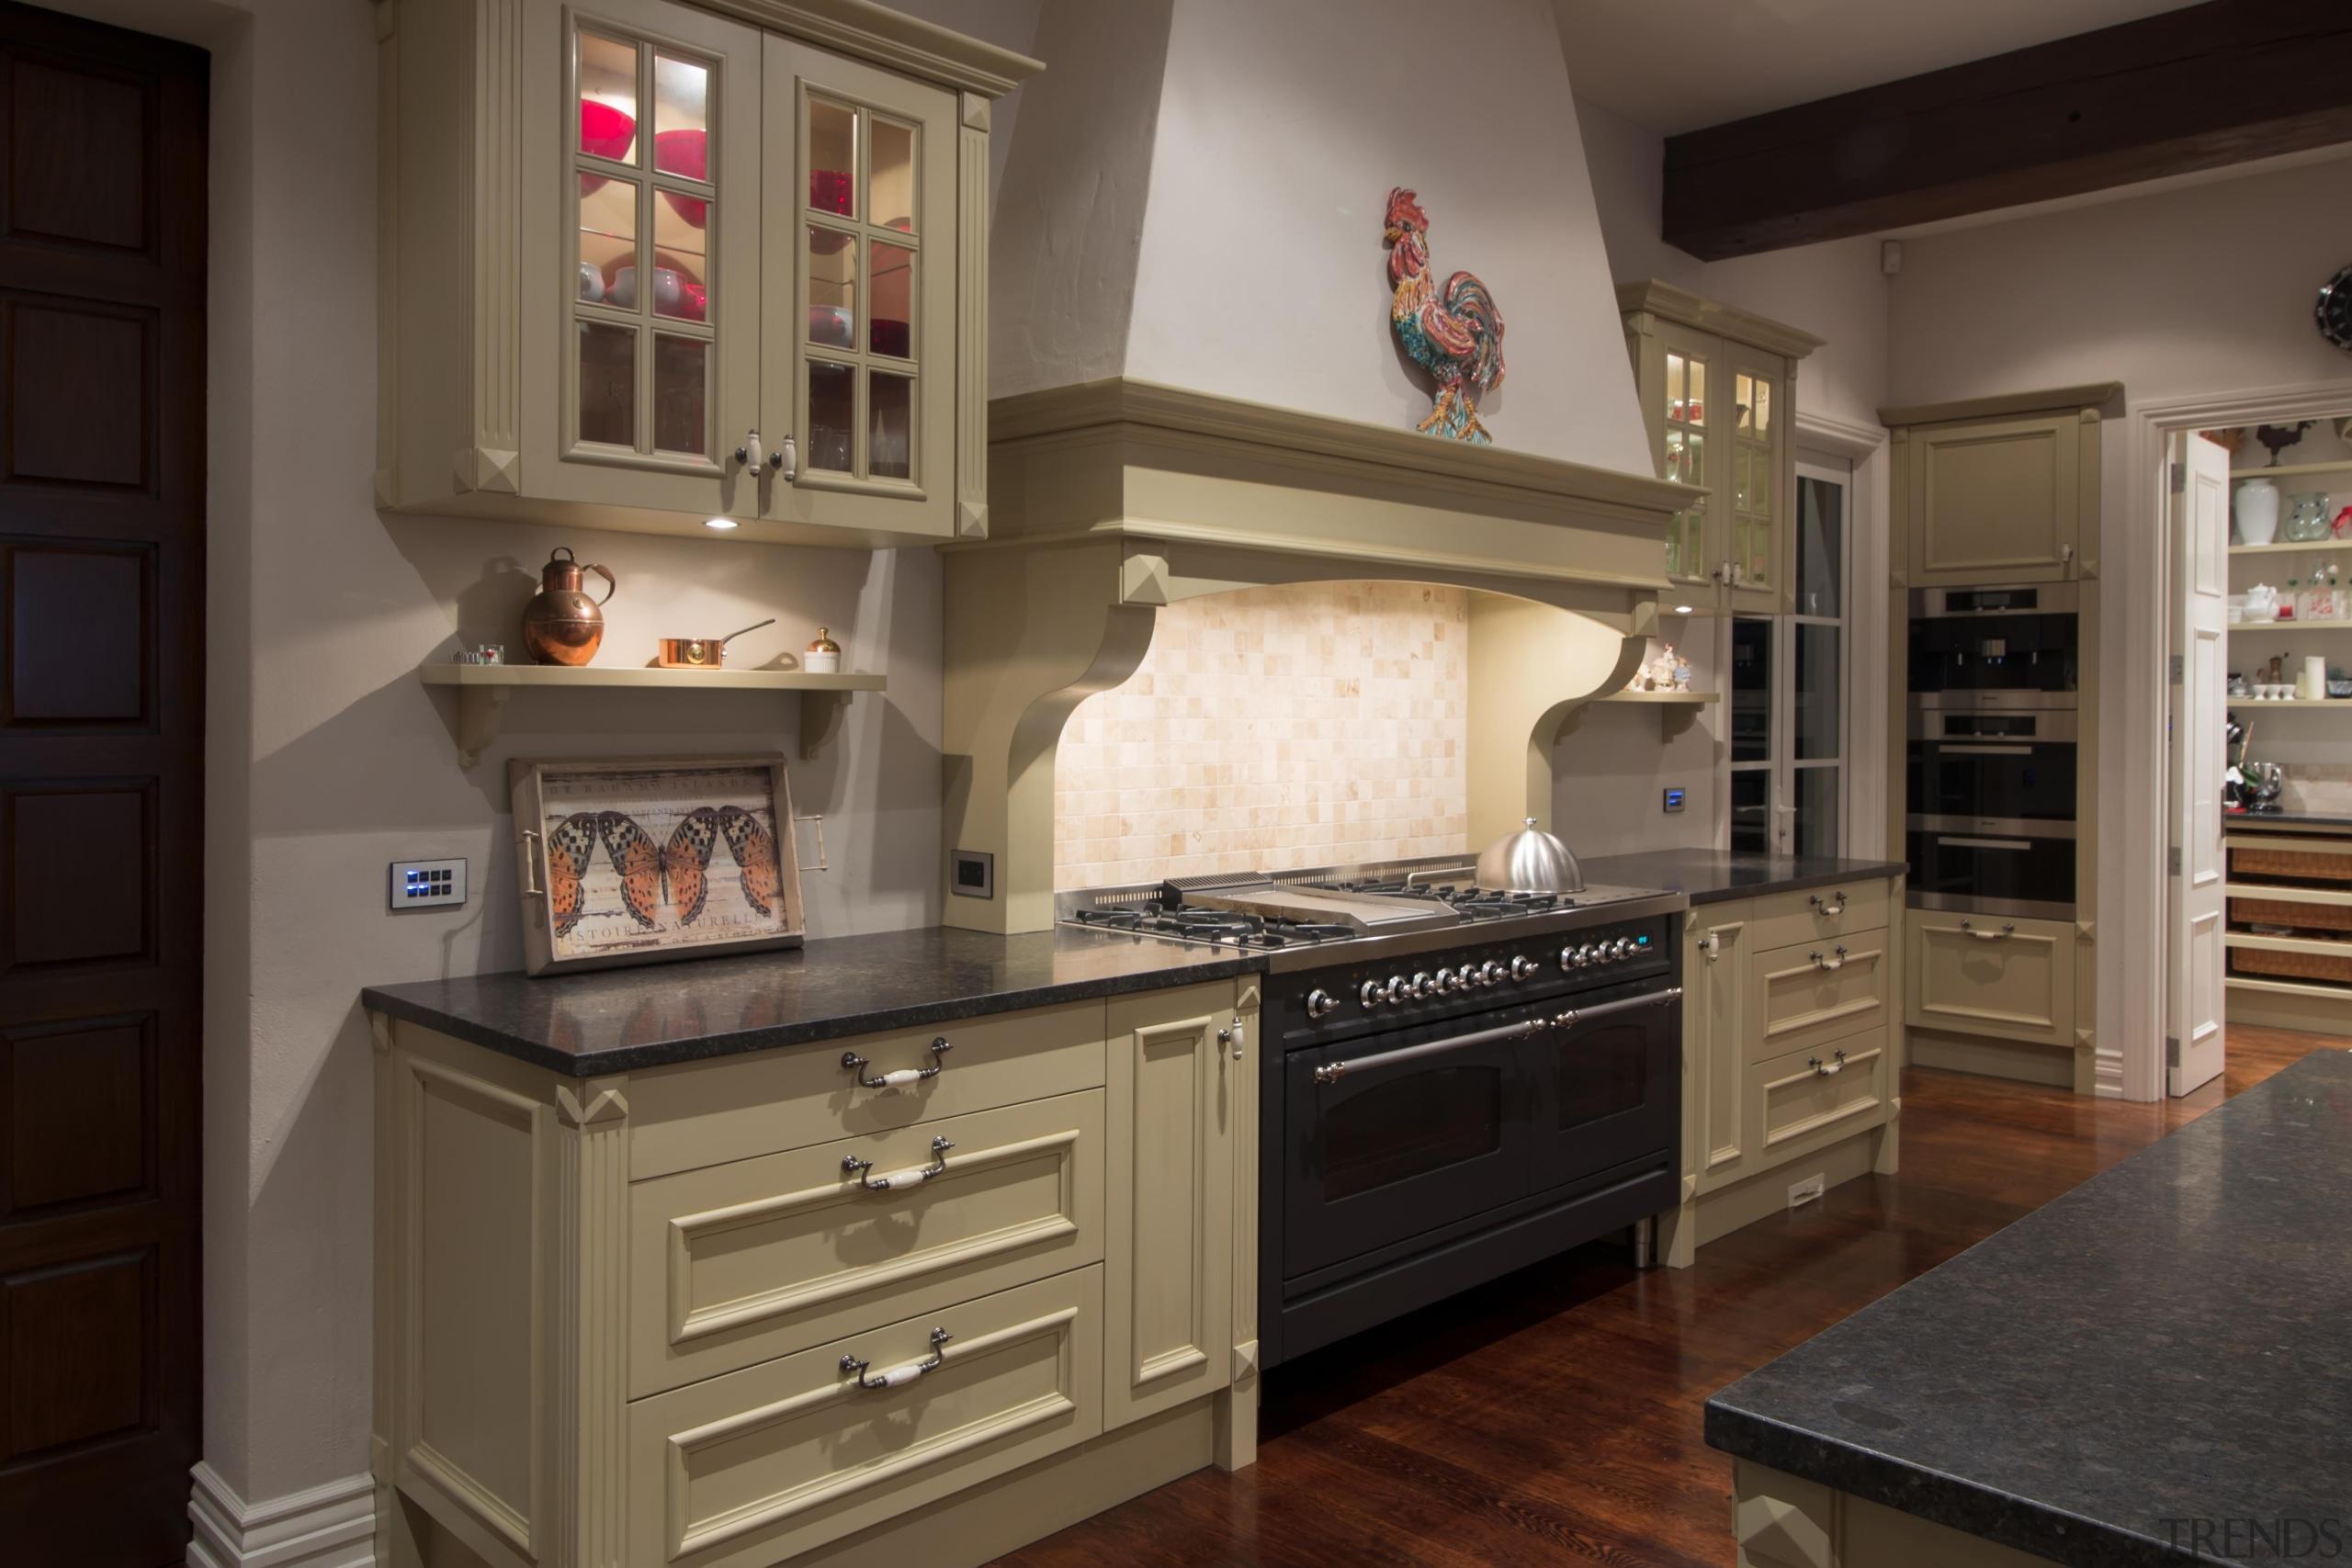 Img 4535 - cabinetry   countertop   cuisine cabinetry, countertop, cuisine classique, furniture, interior design, kitchen, room, brown, black